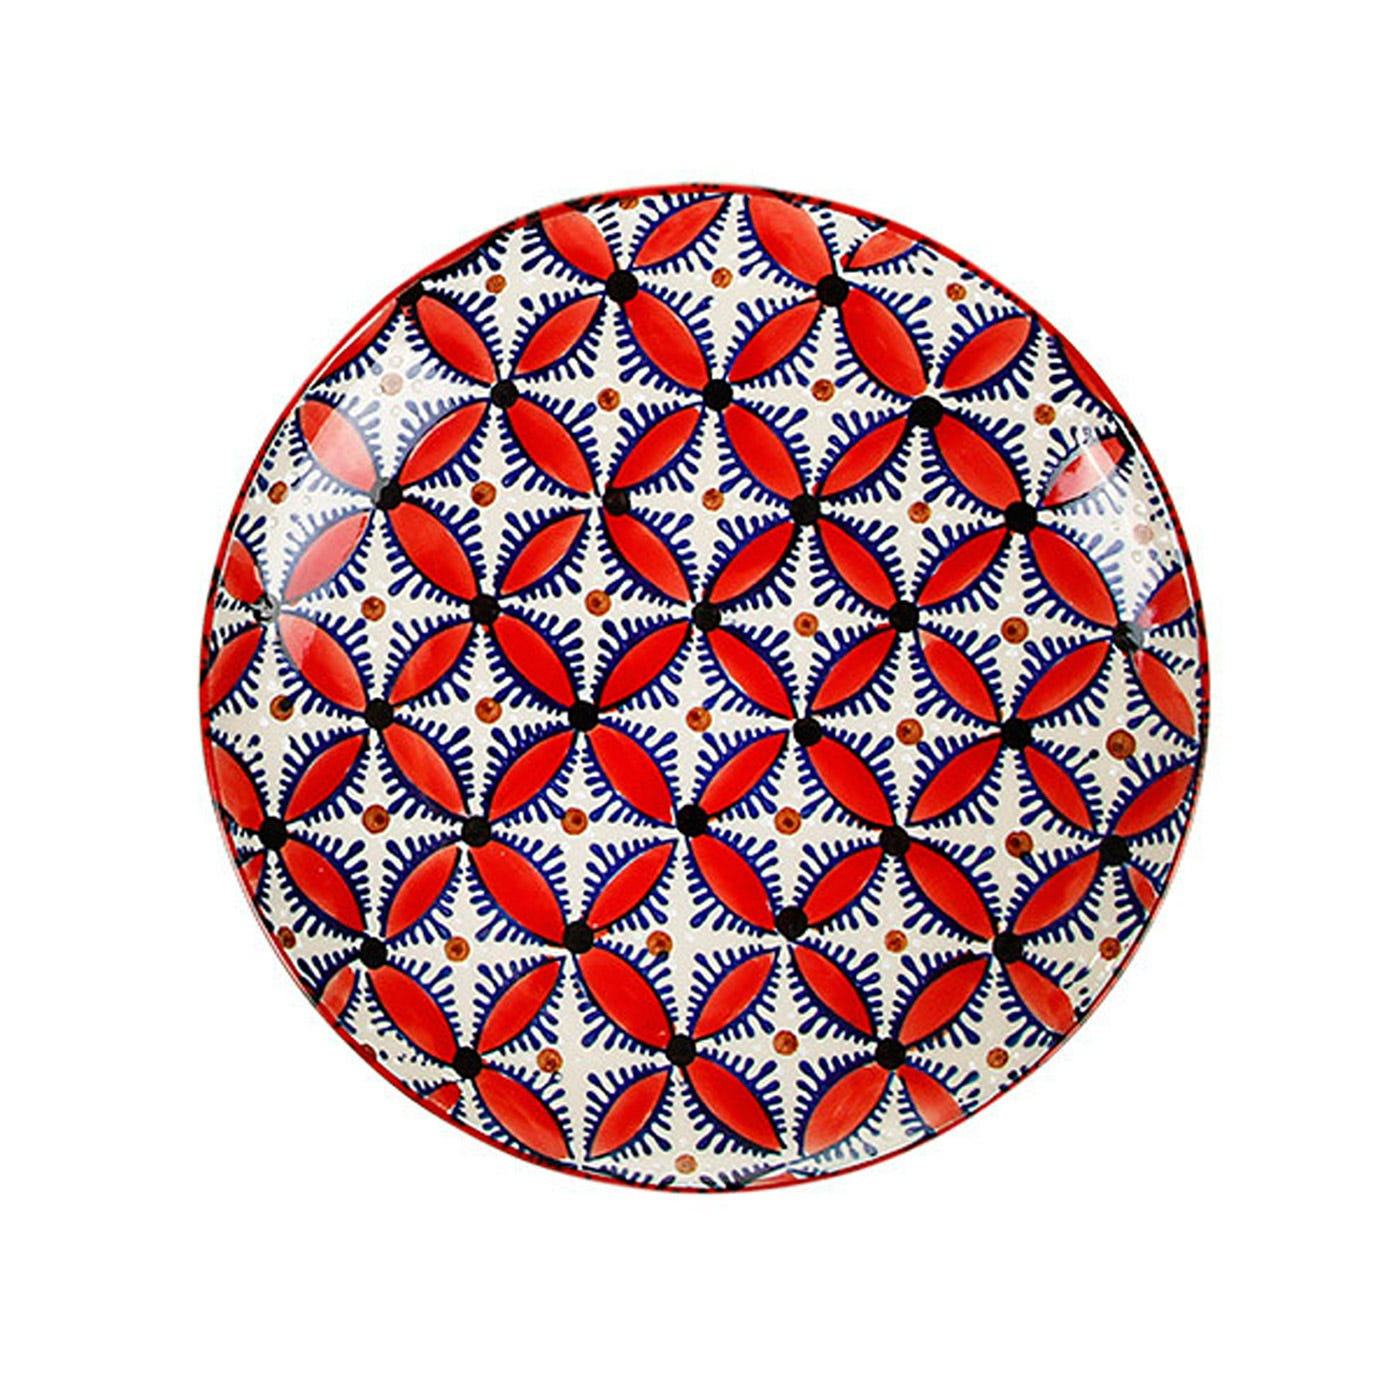 Hippy Dinner Plate Red